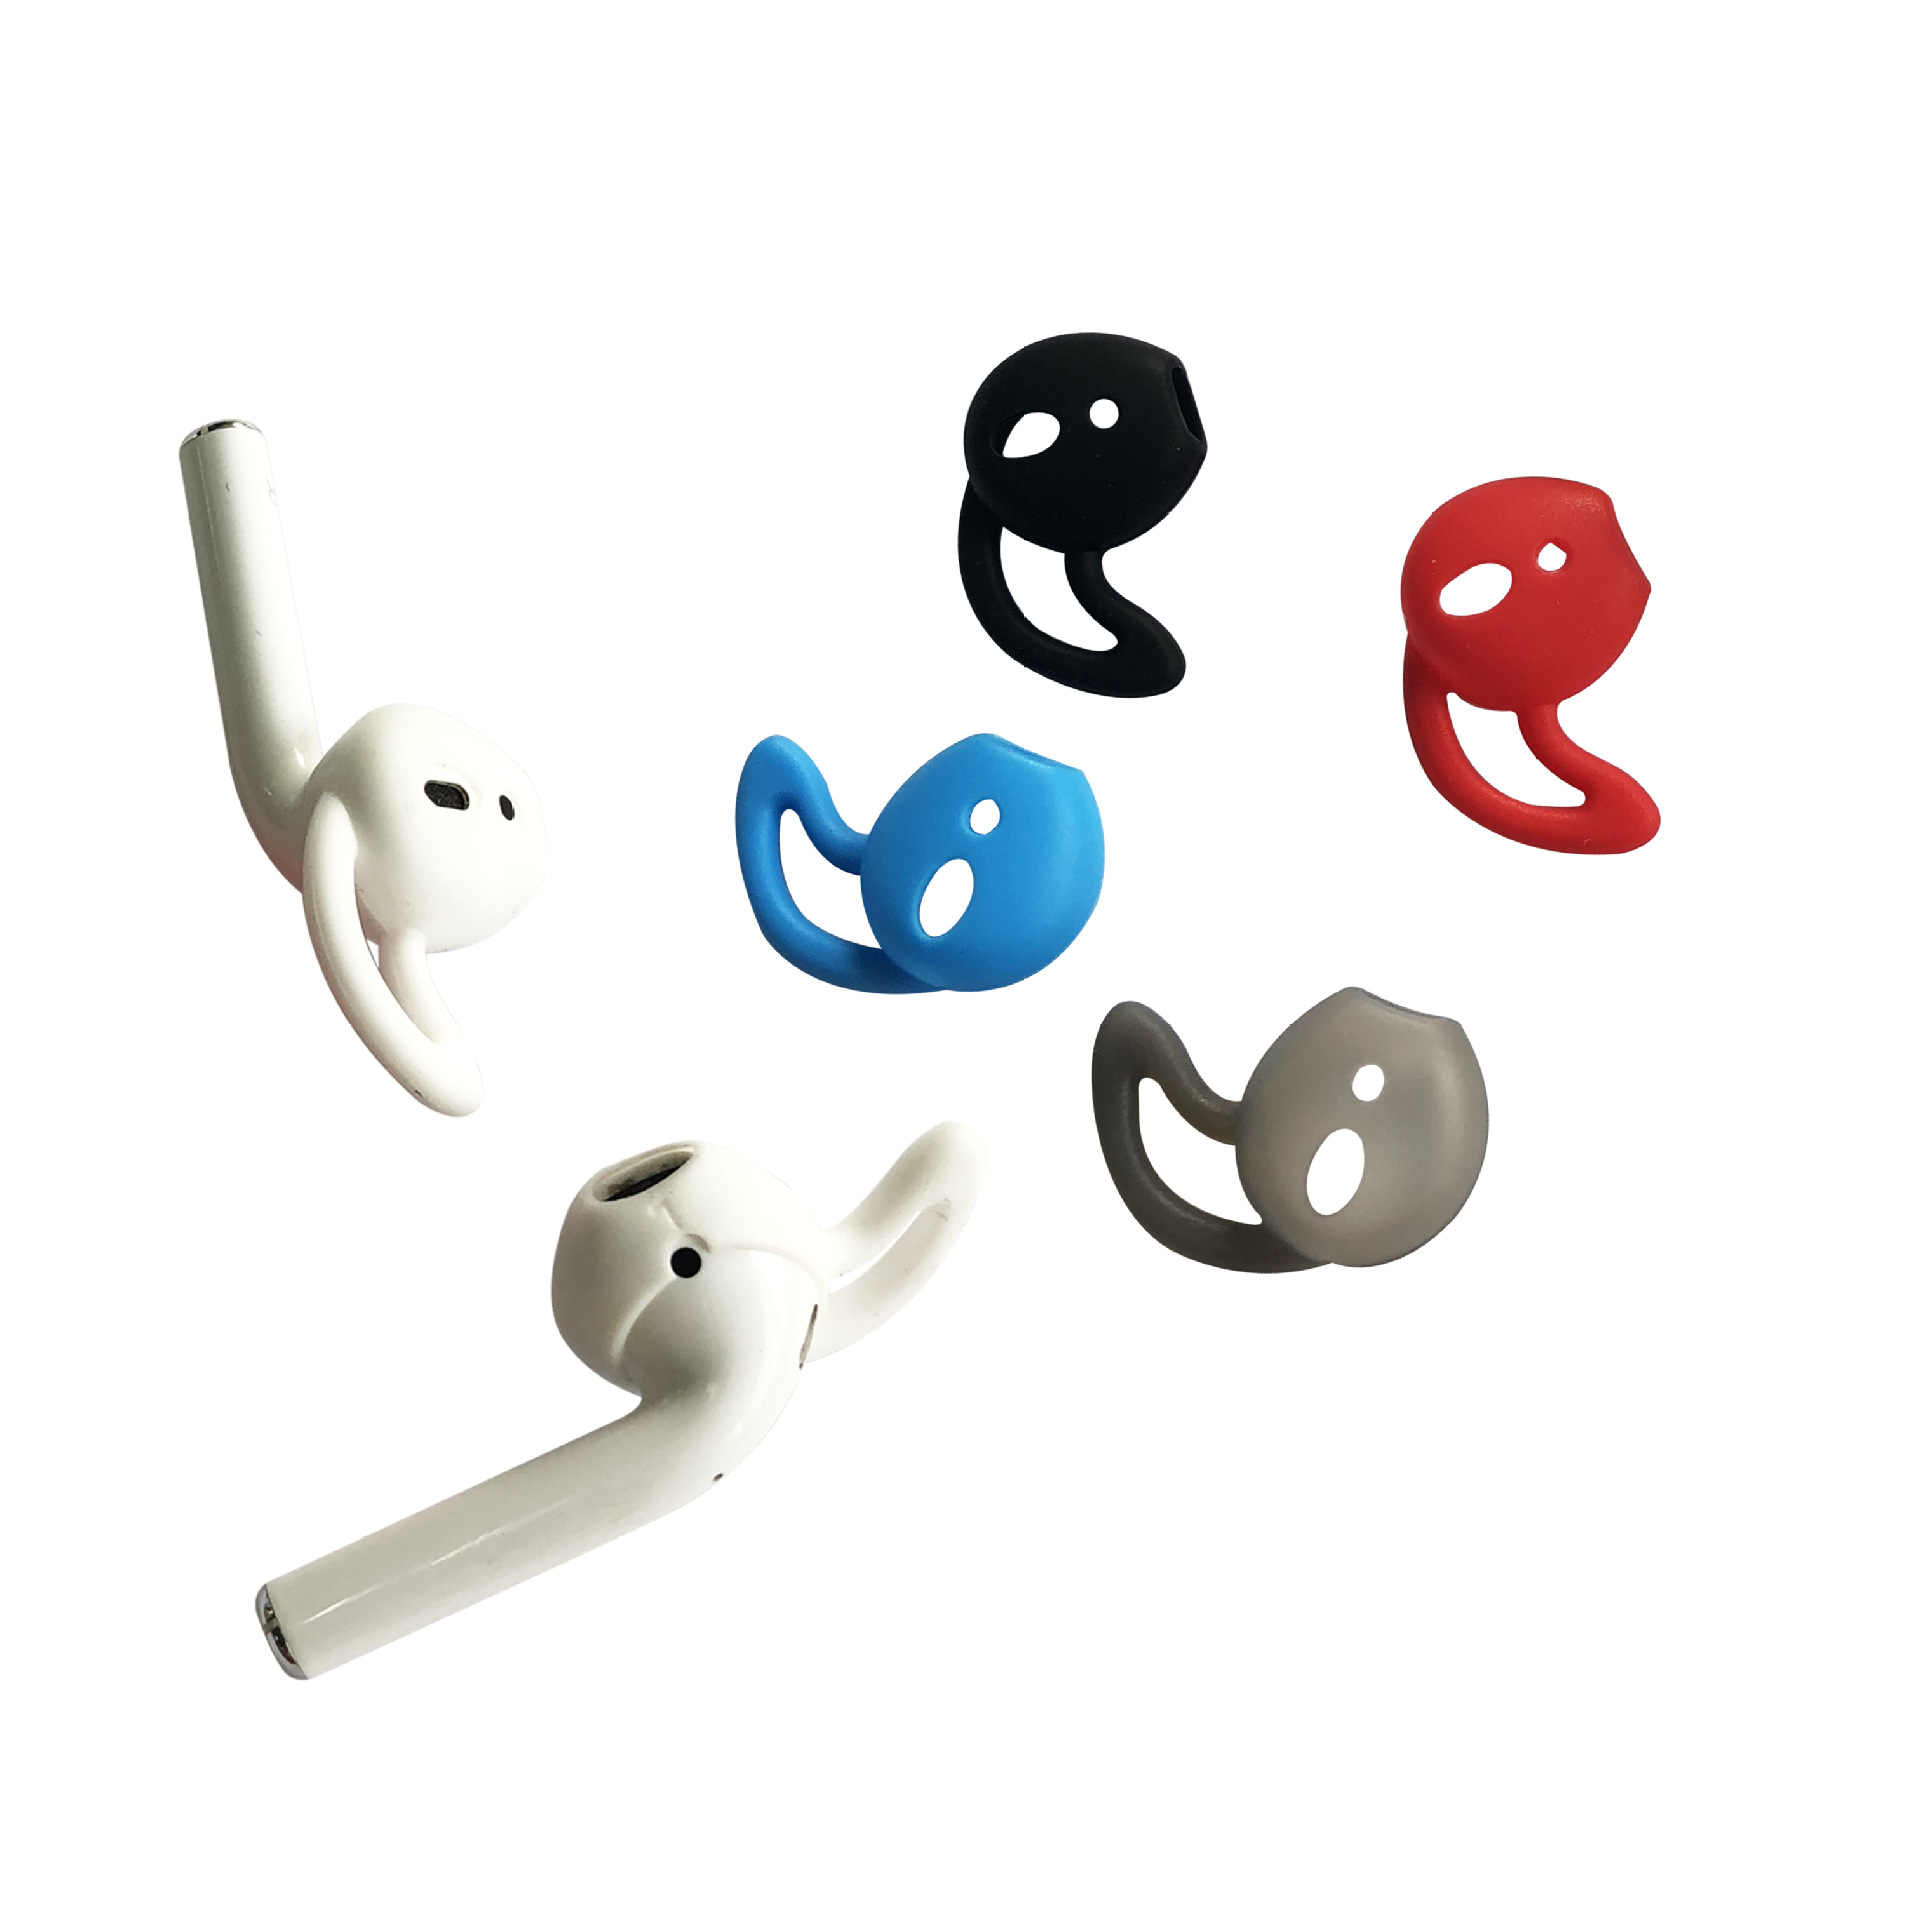 Untuk Apple Air Polong Nirkabel Bluetooth Silicone Cover Tips Topi Earphone Case Earbud Menutupi Headphone Eartip Silikon Kasus